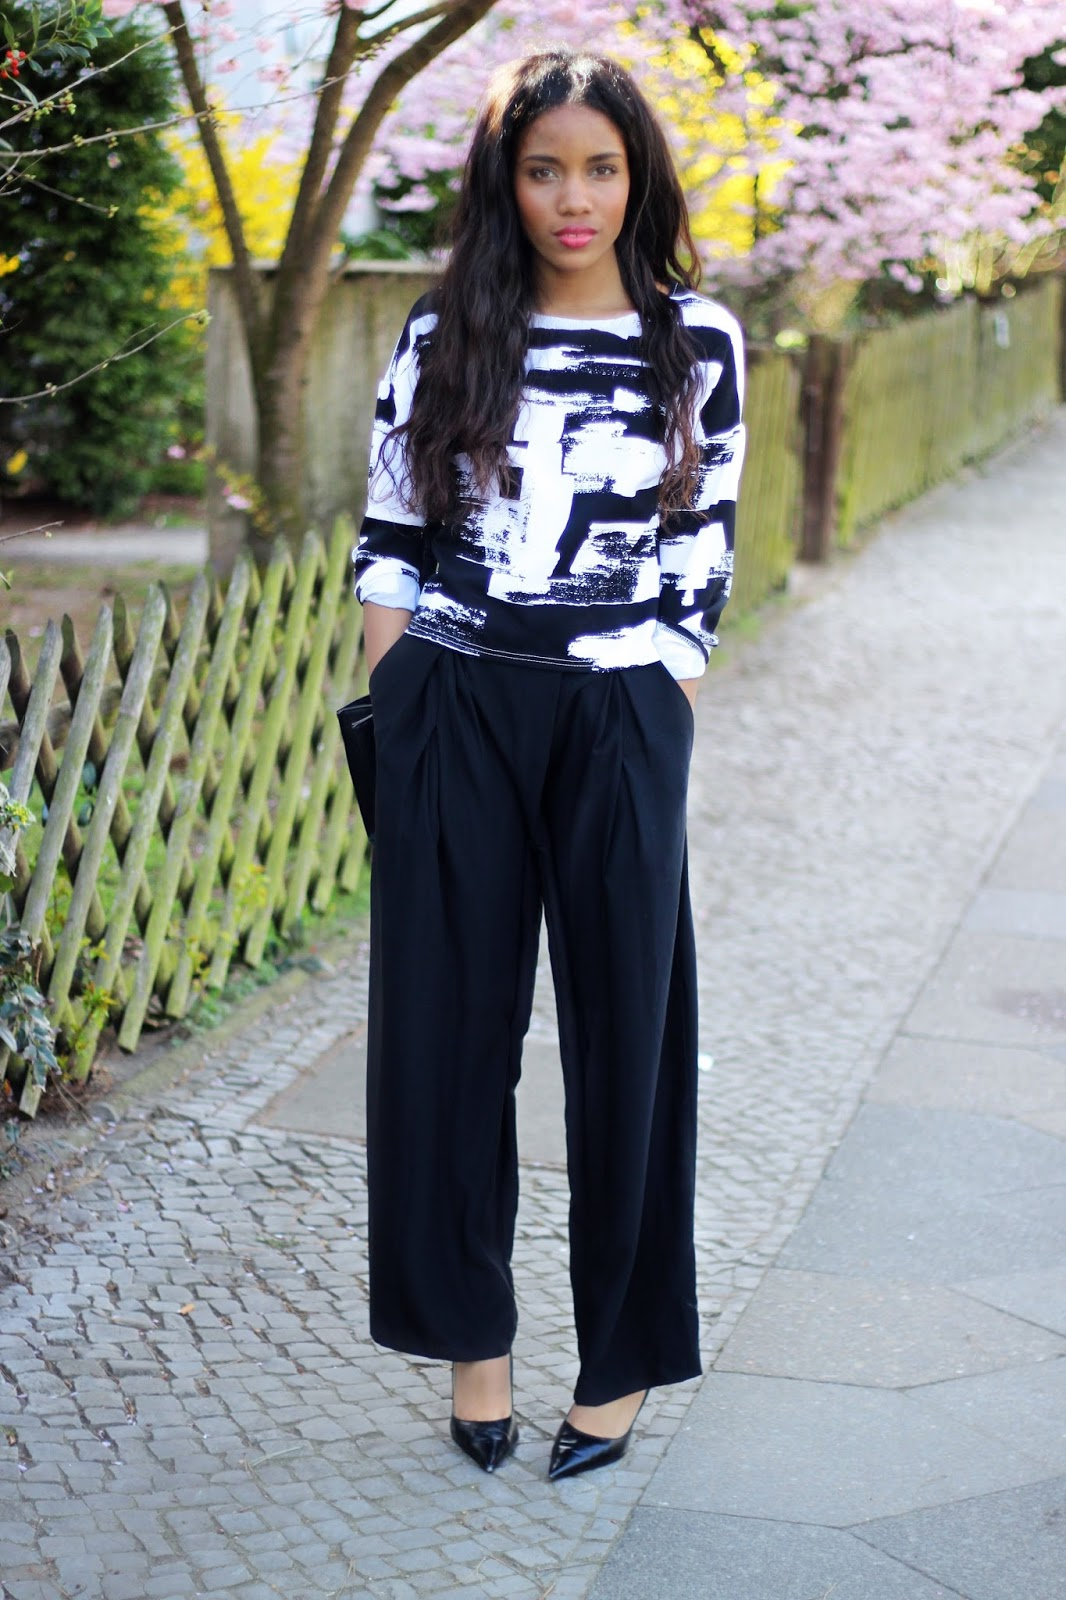 Mode_Blog_Berlin_flared_pants